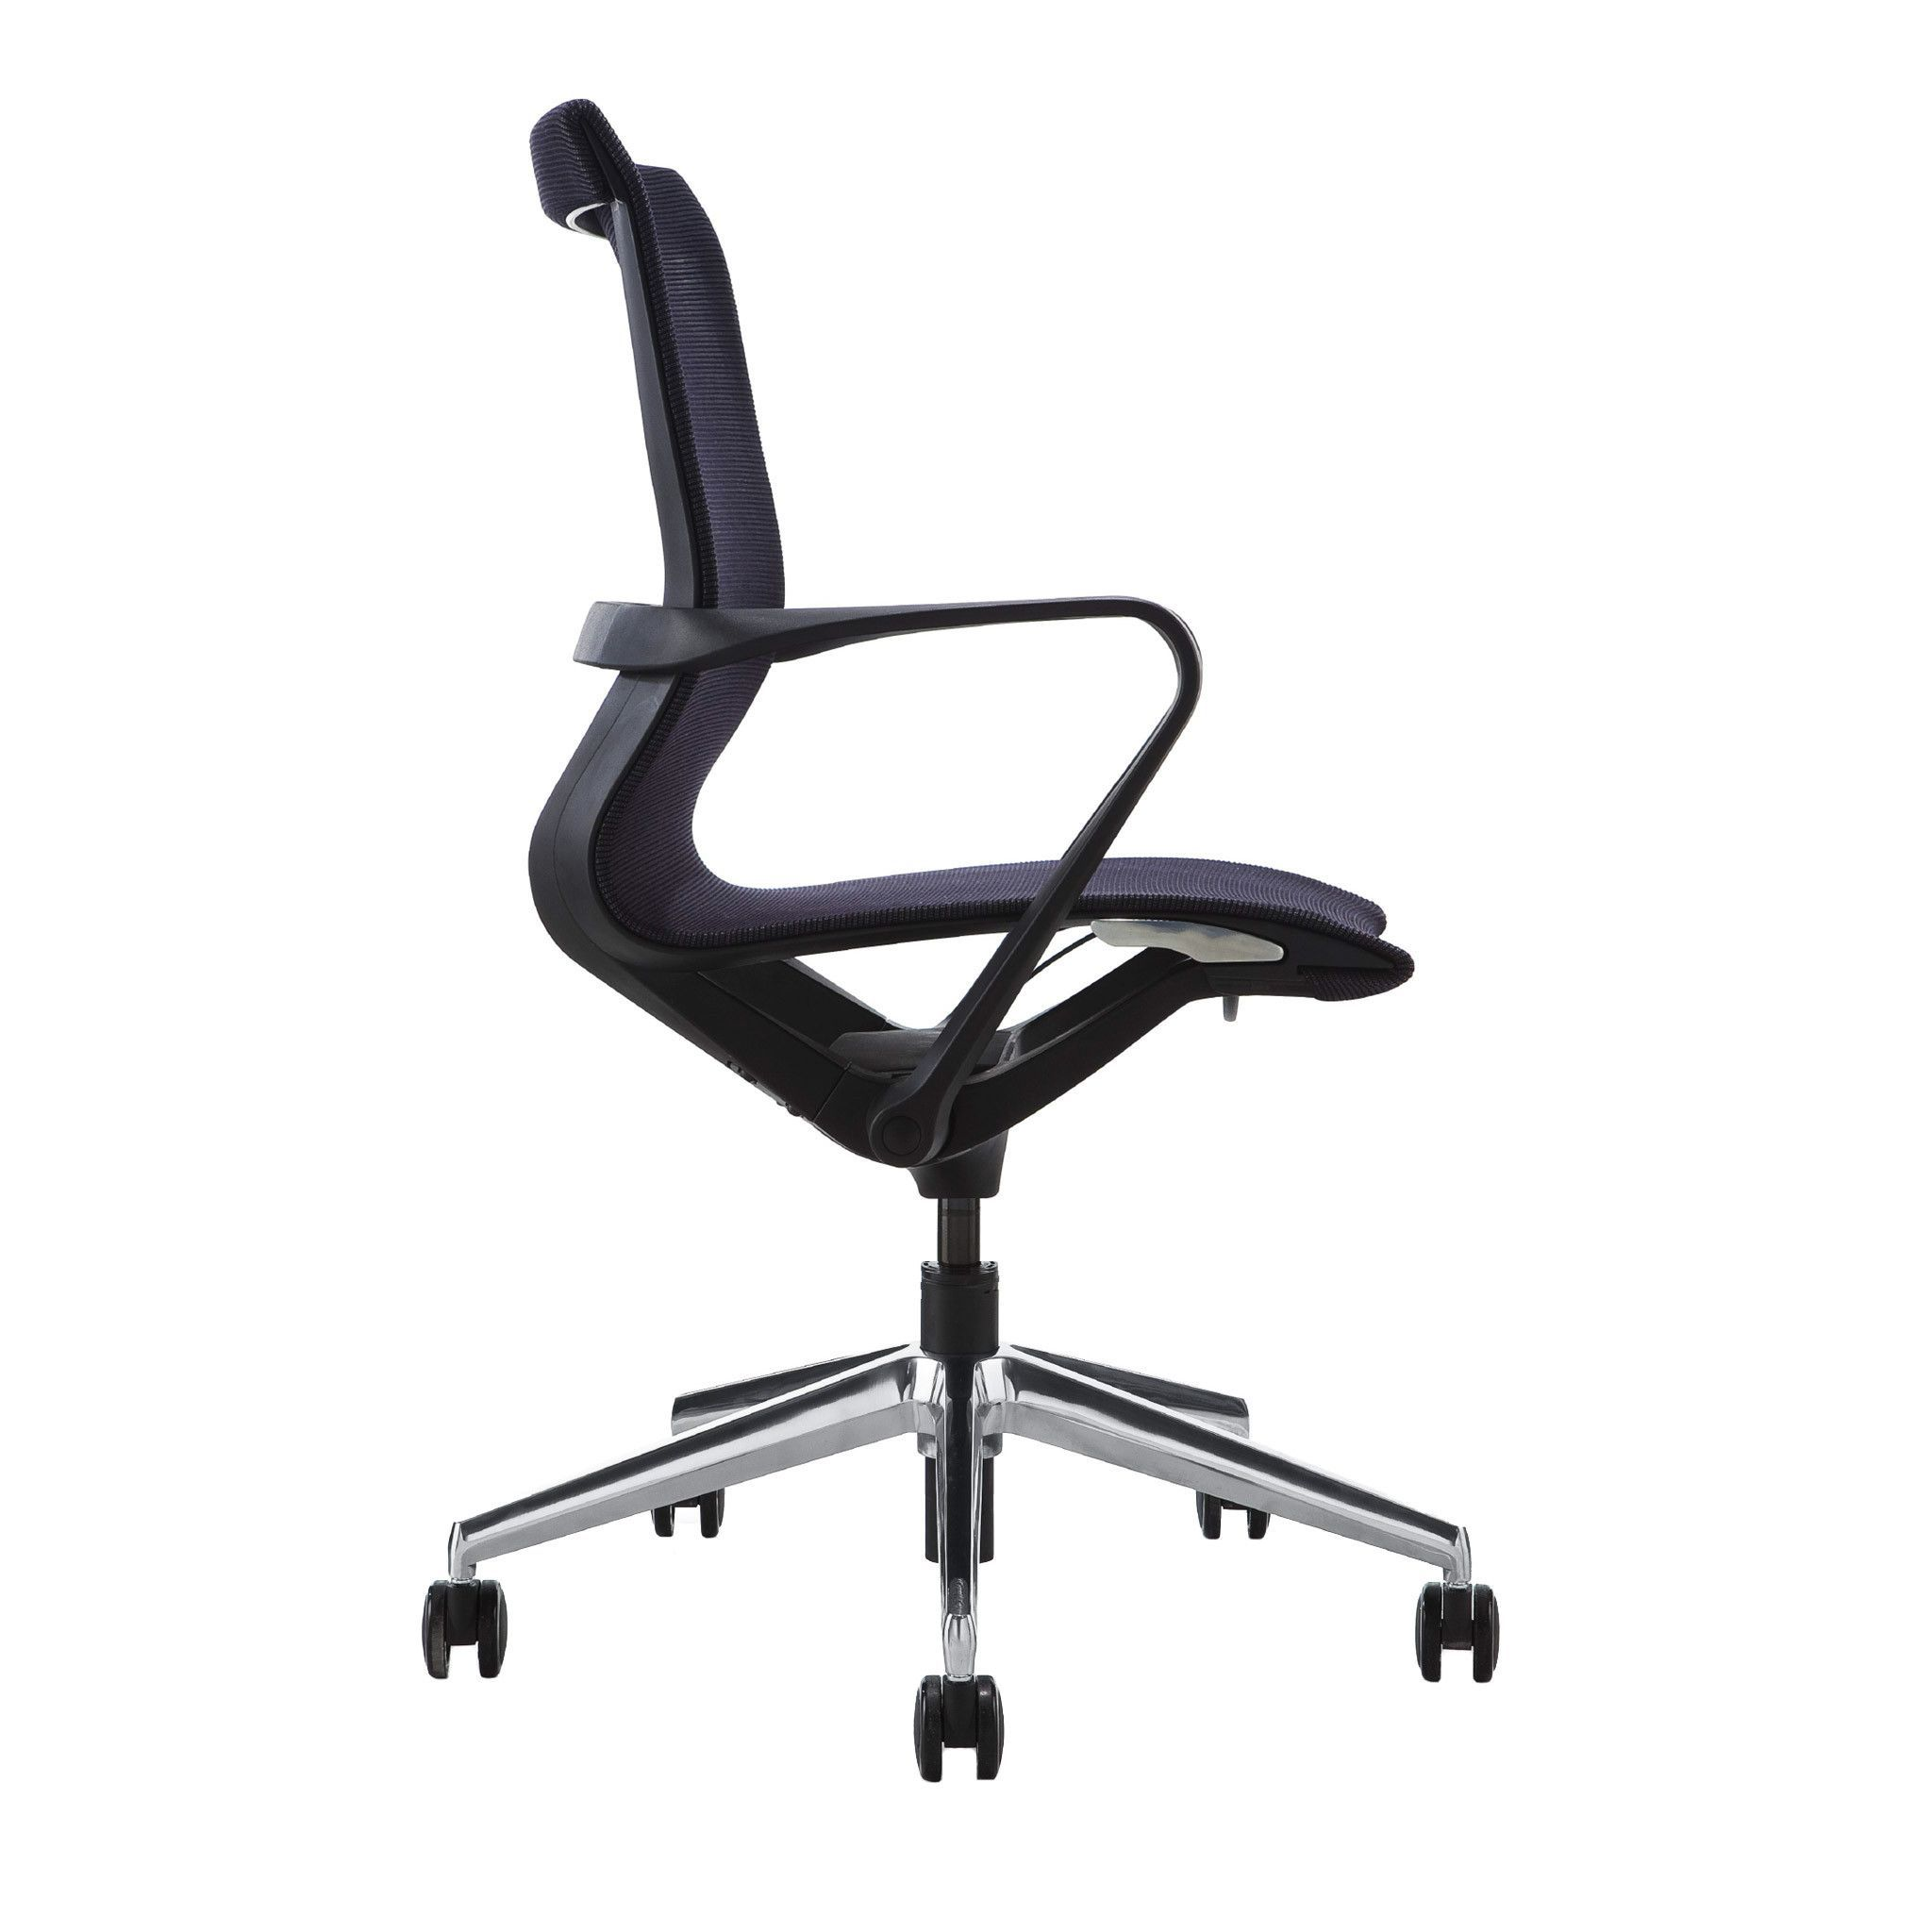 Empire Mesh Management Chair (Black) Green chair, White